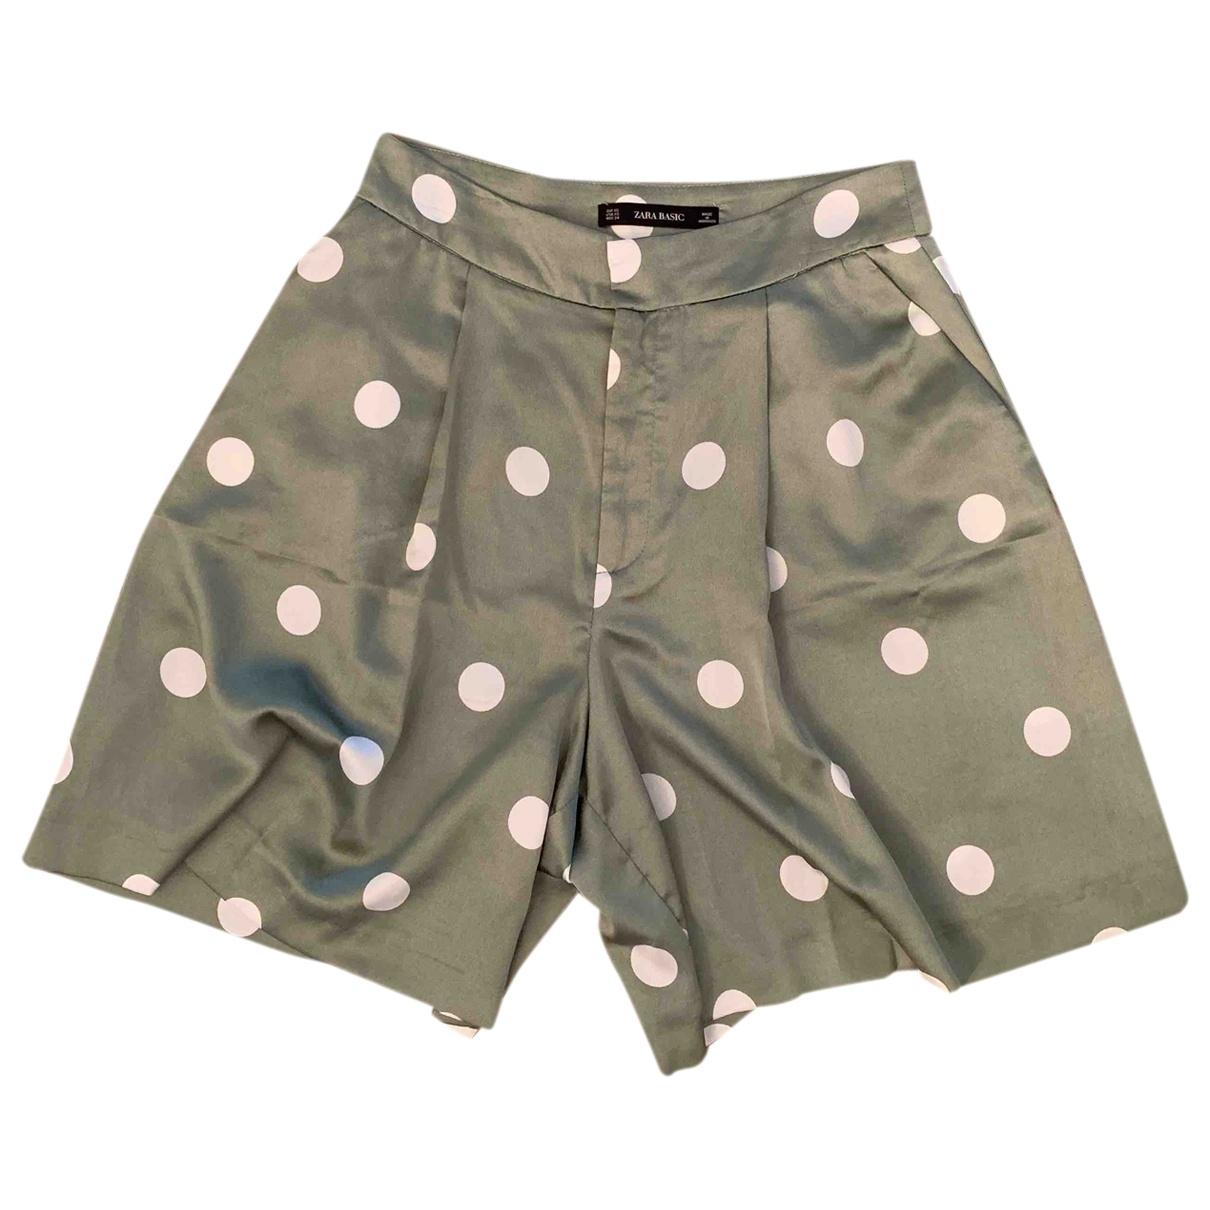 Zara \N Green Shorts for Women XS International